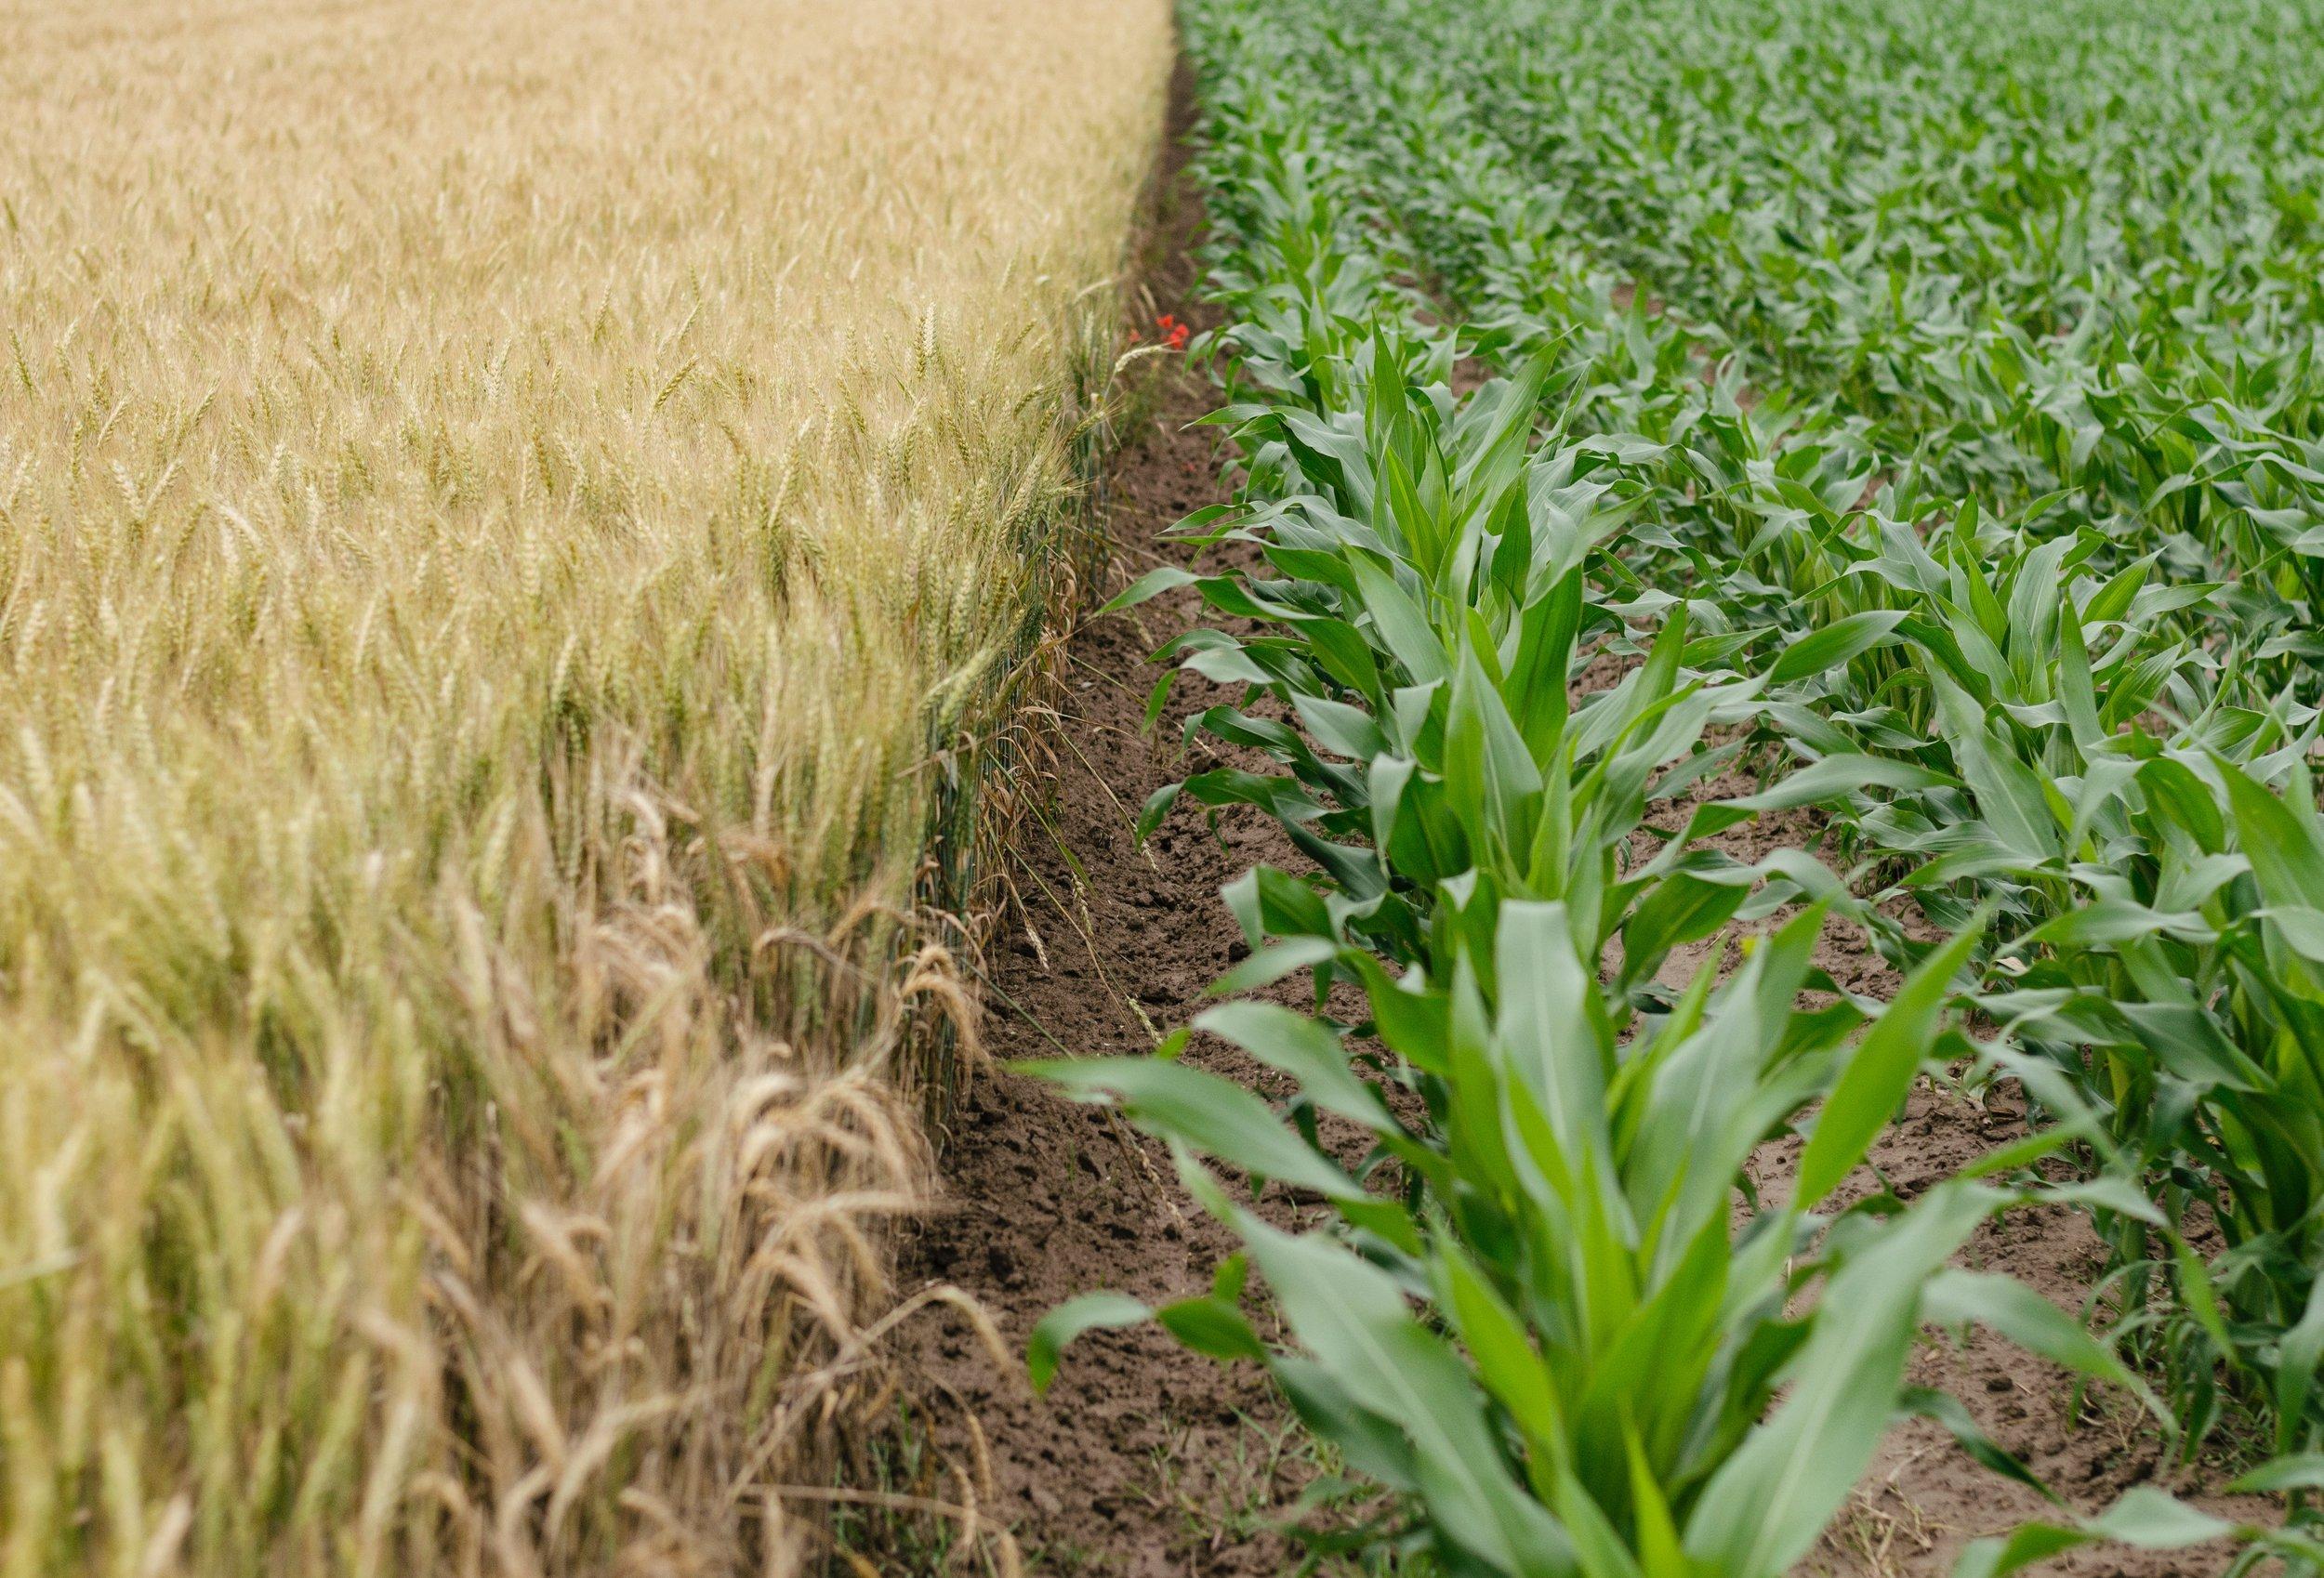 Brian Baldridge values agriculture jobs